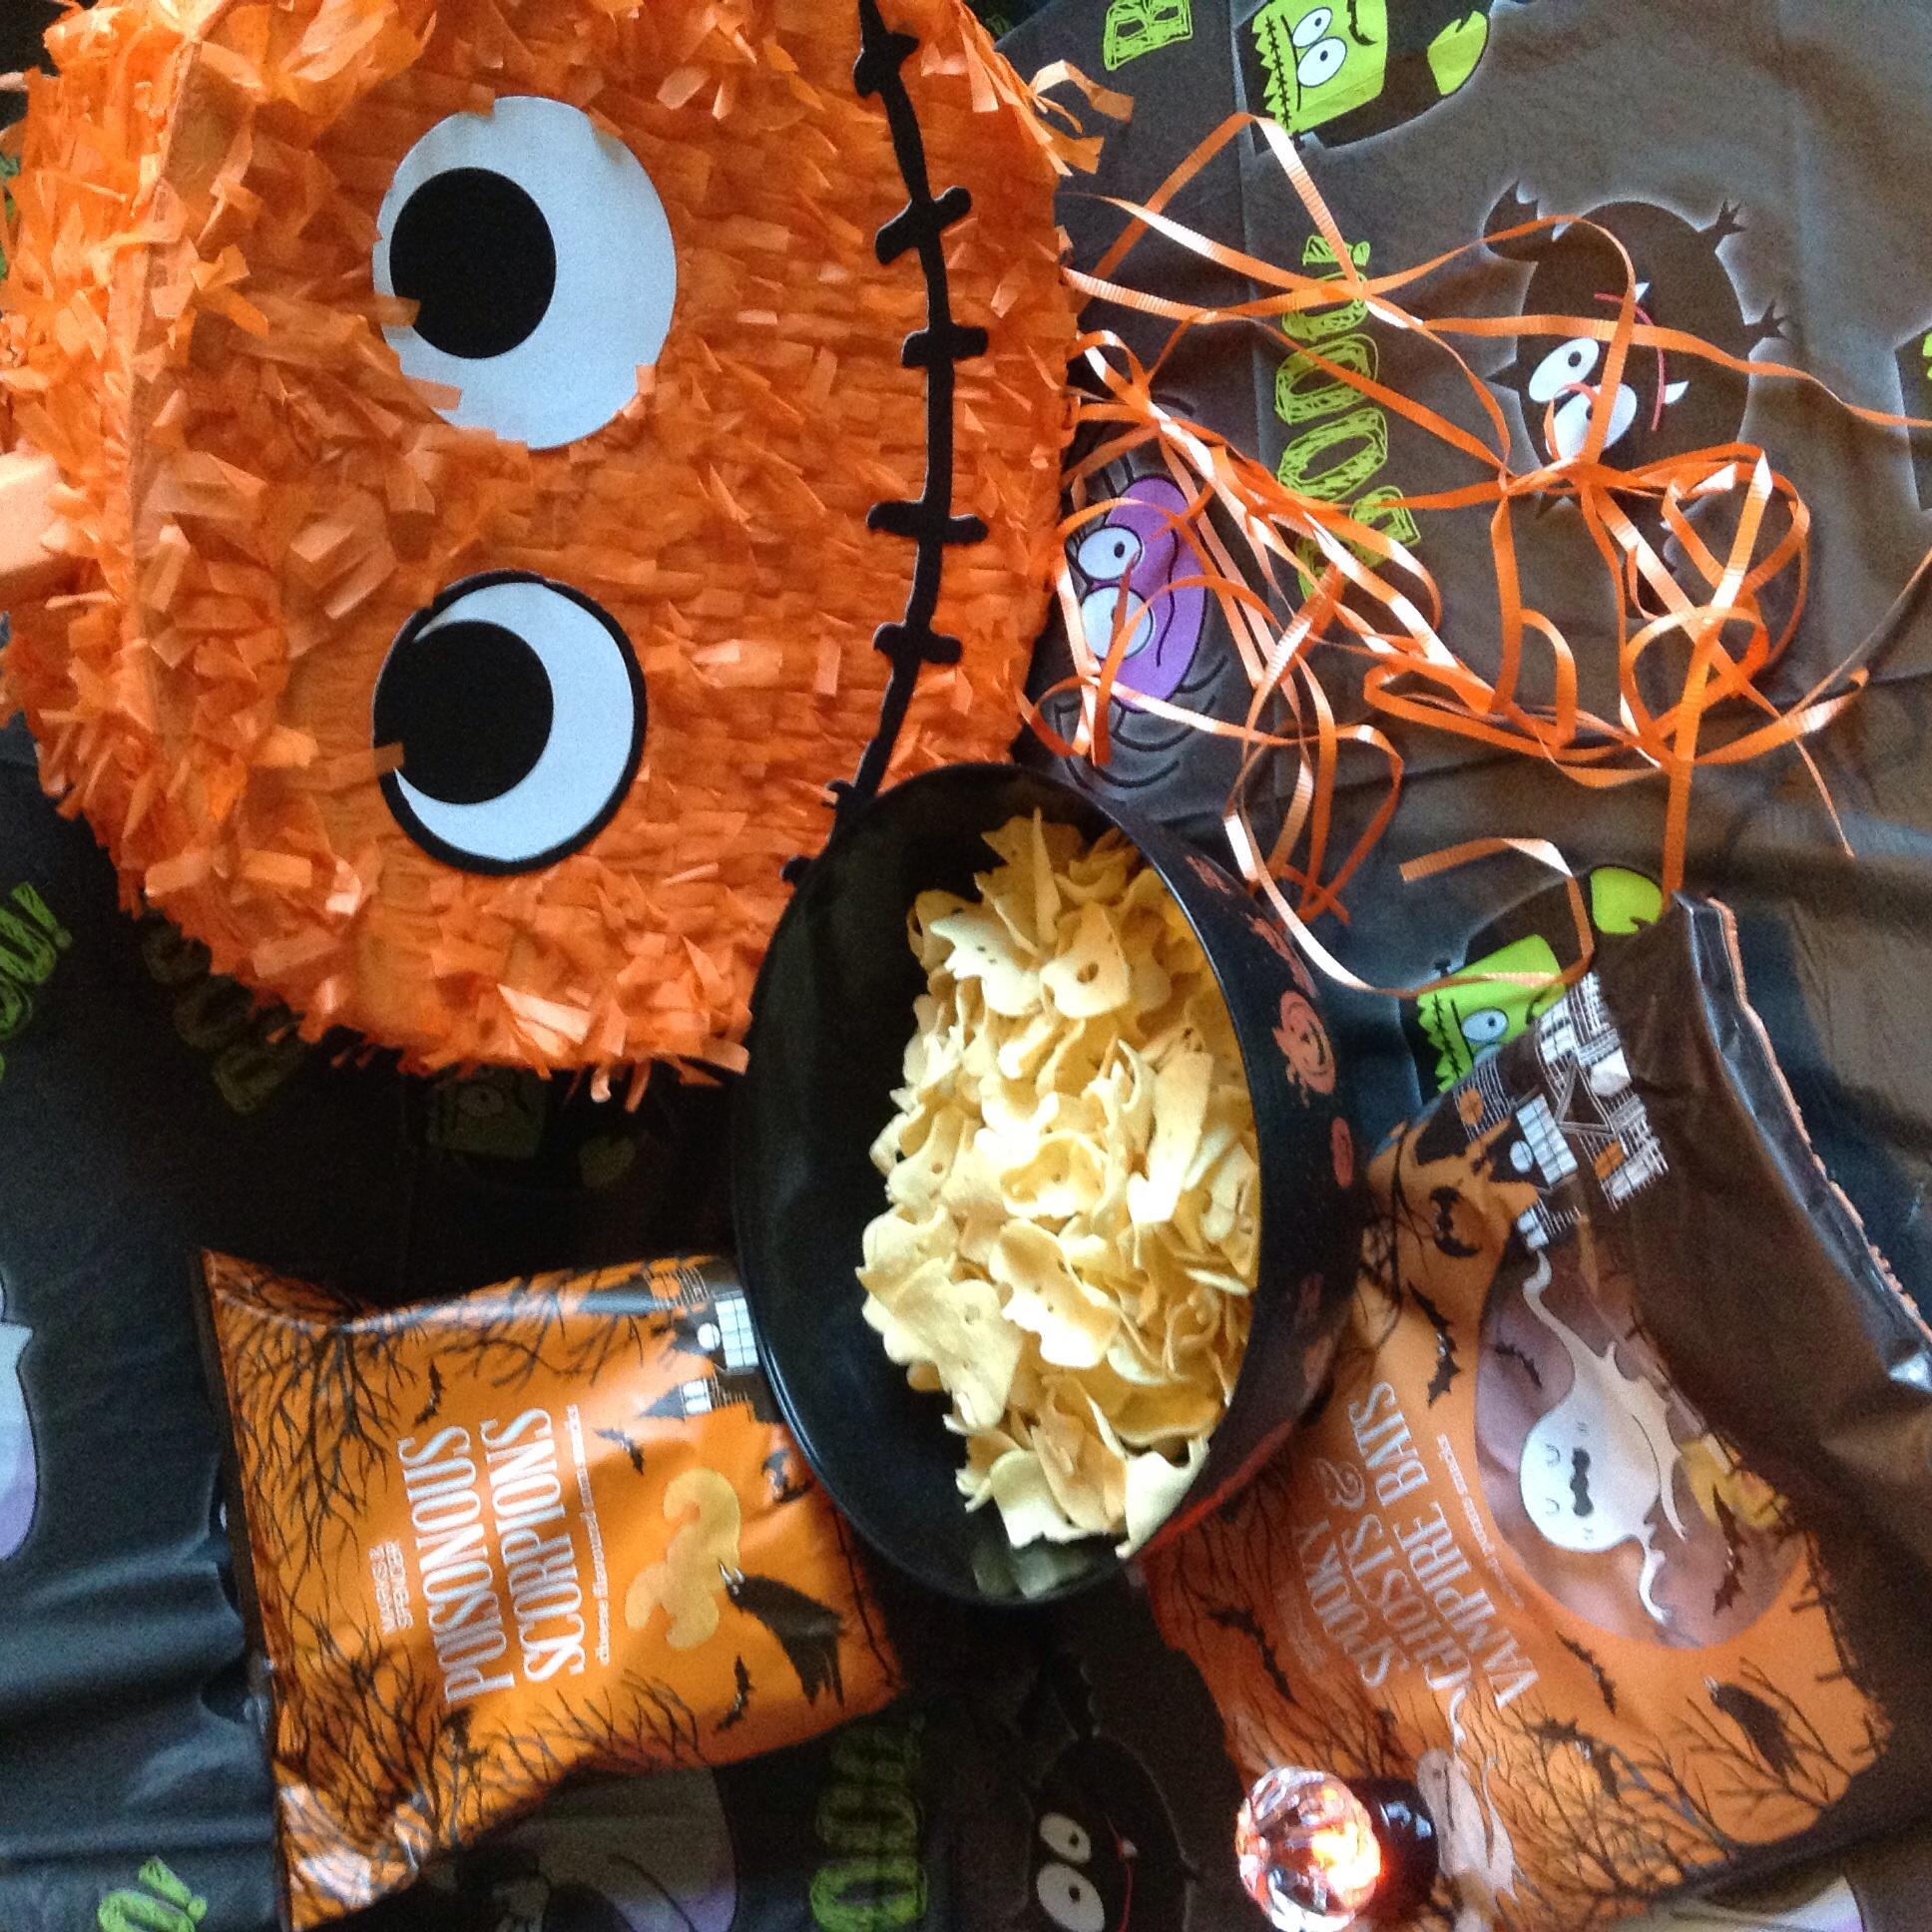 Pumpkin piñata £10 - Scorpion snacks or Spooky Ghosts & Vampire Bats 2 for £2 - Pumpkin Tealight £3.50